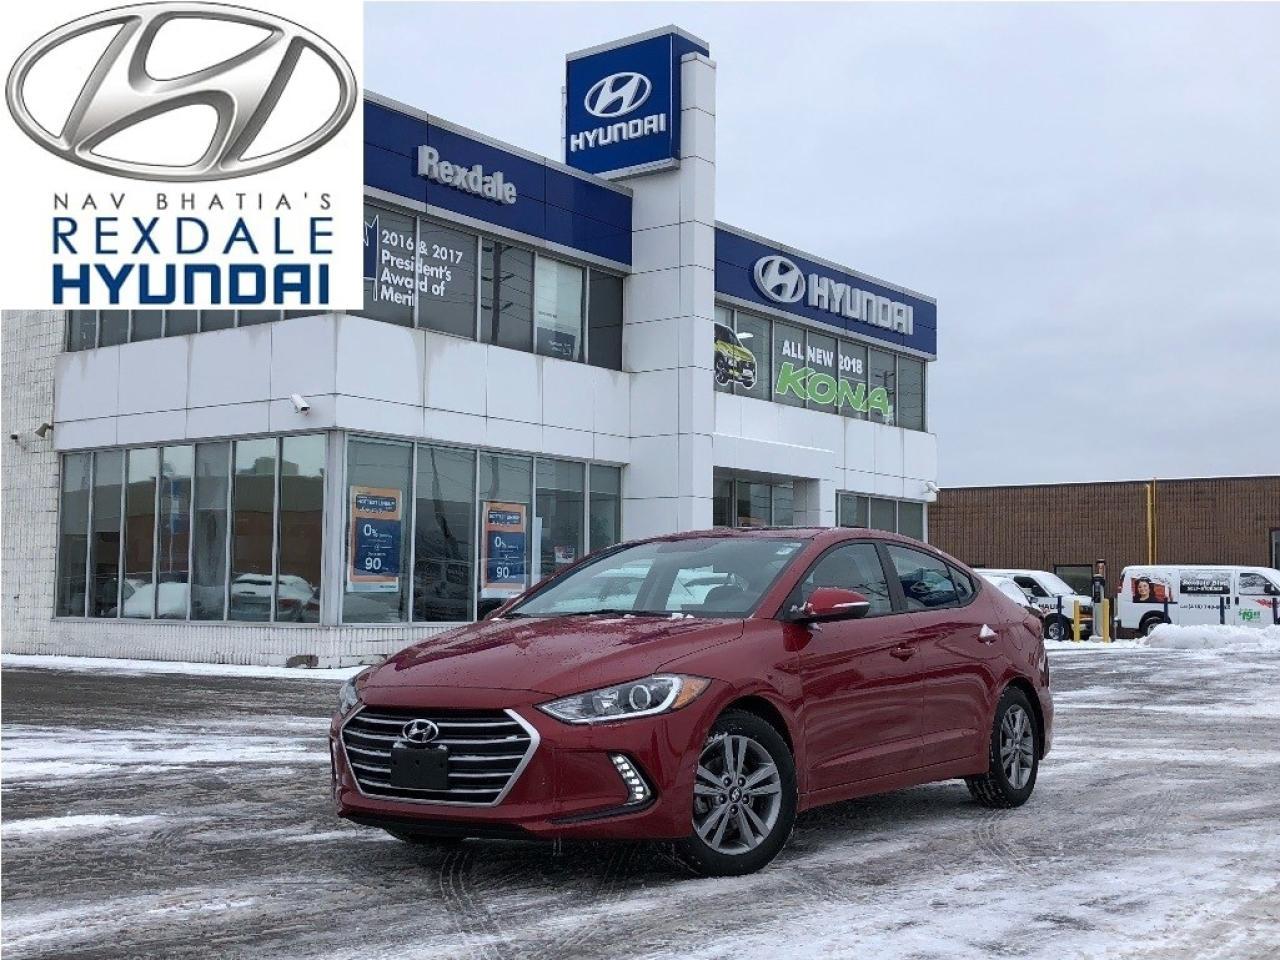 2018 Hyundai Elantra GL SE, Financing available on site